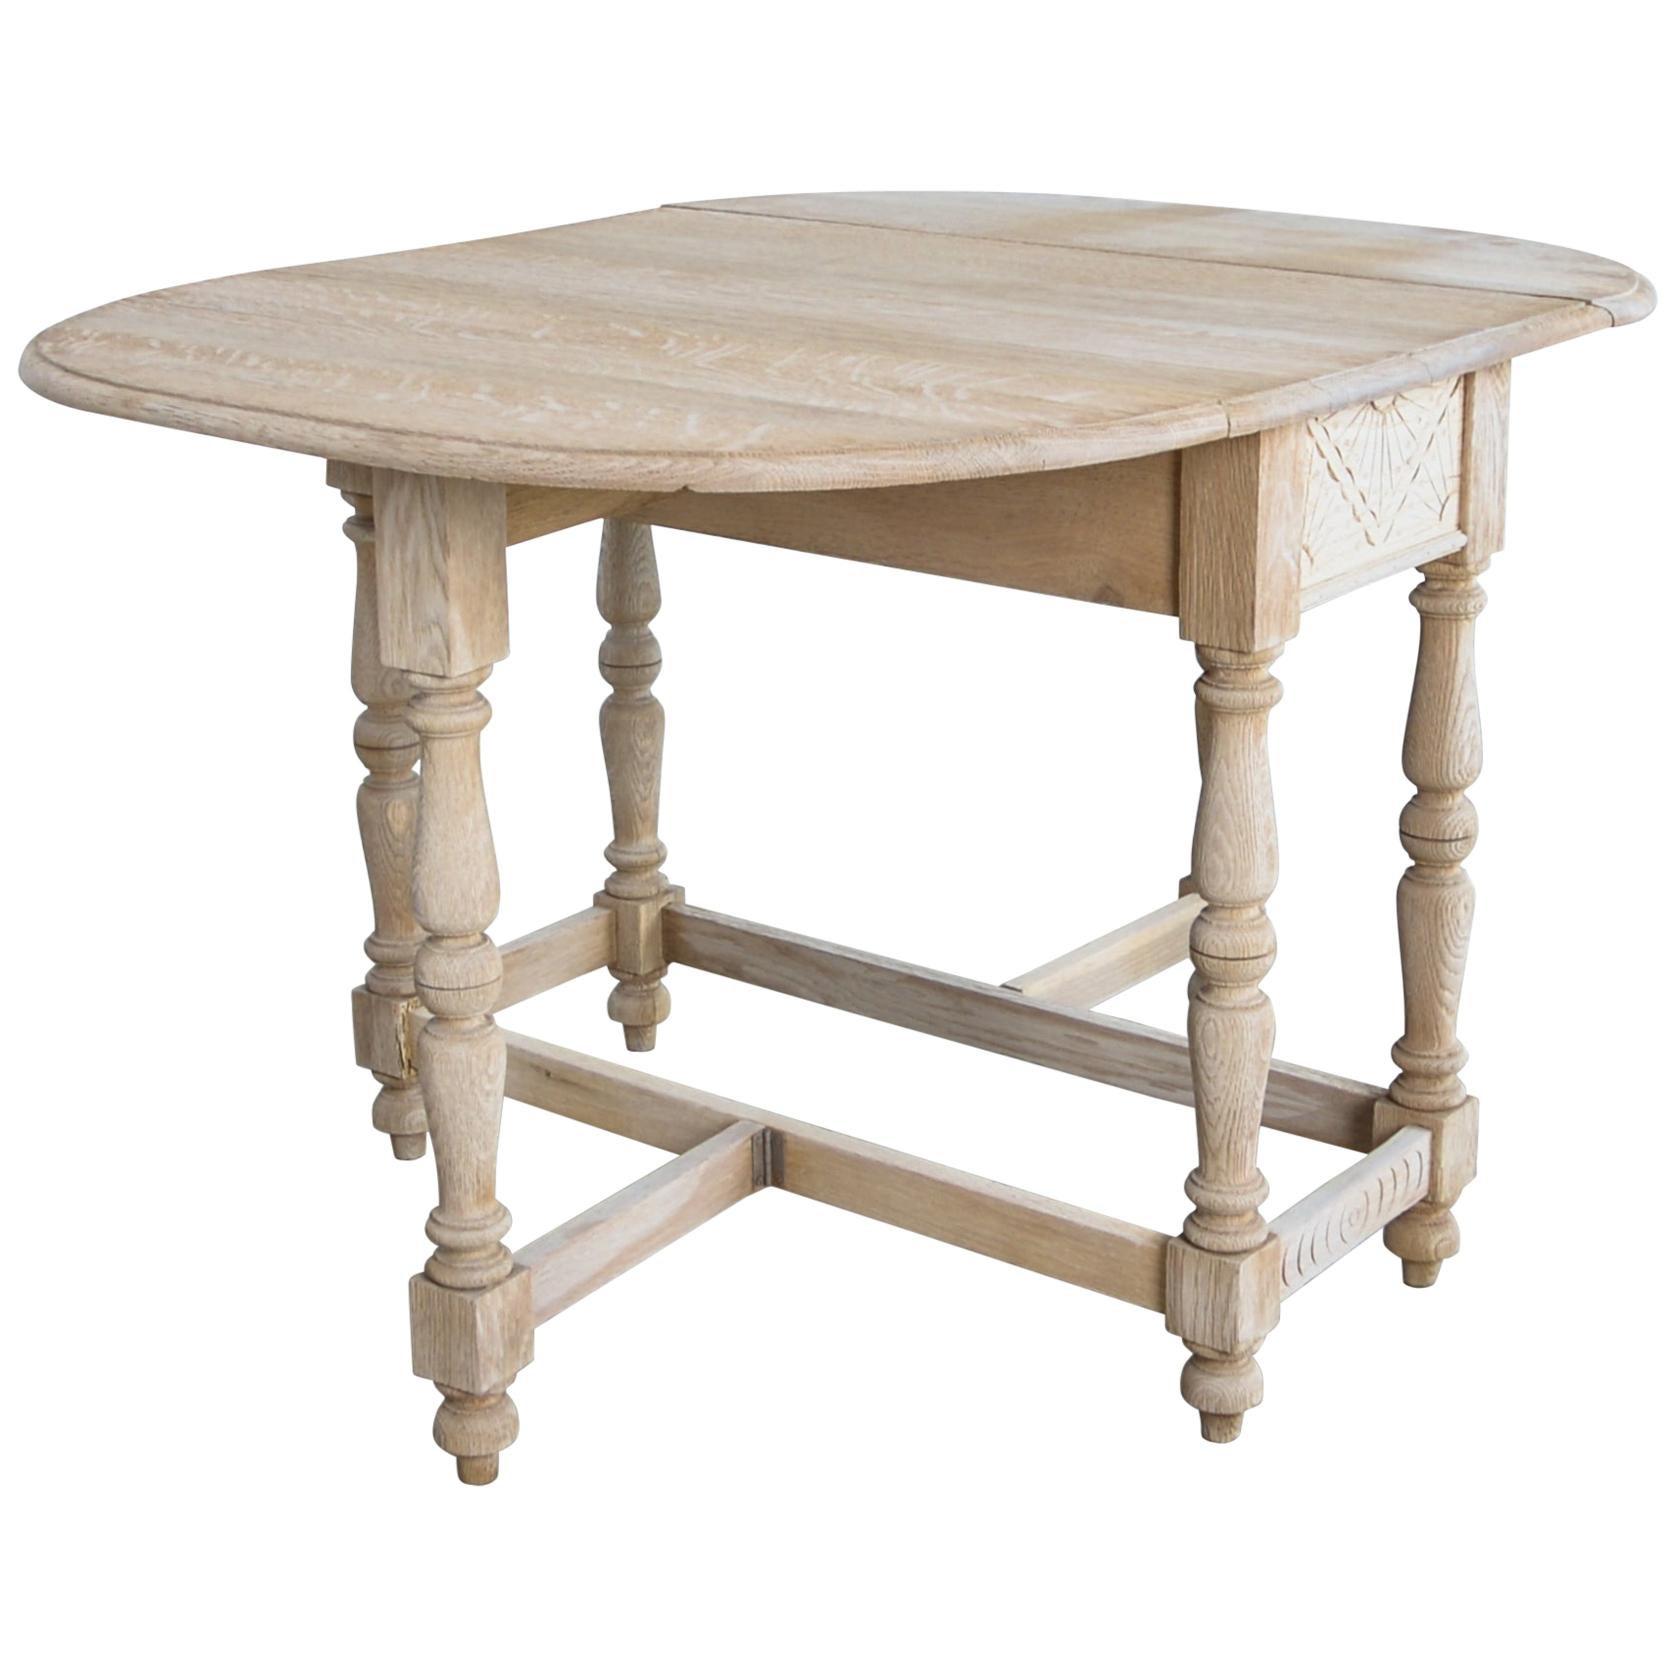 1920s Gate Leg English Oak Dining Table